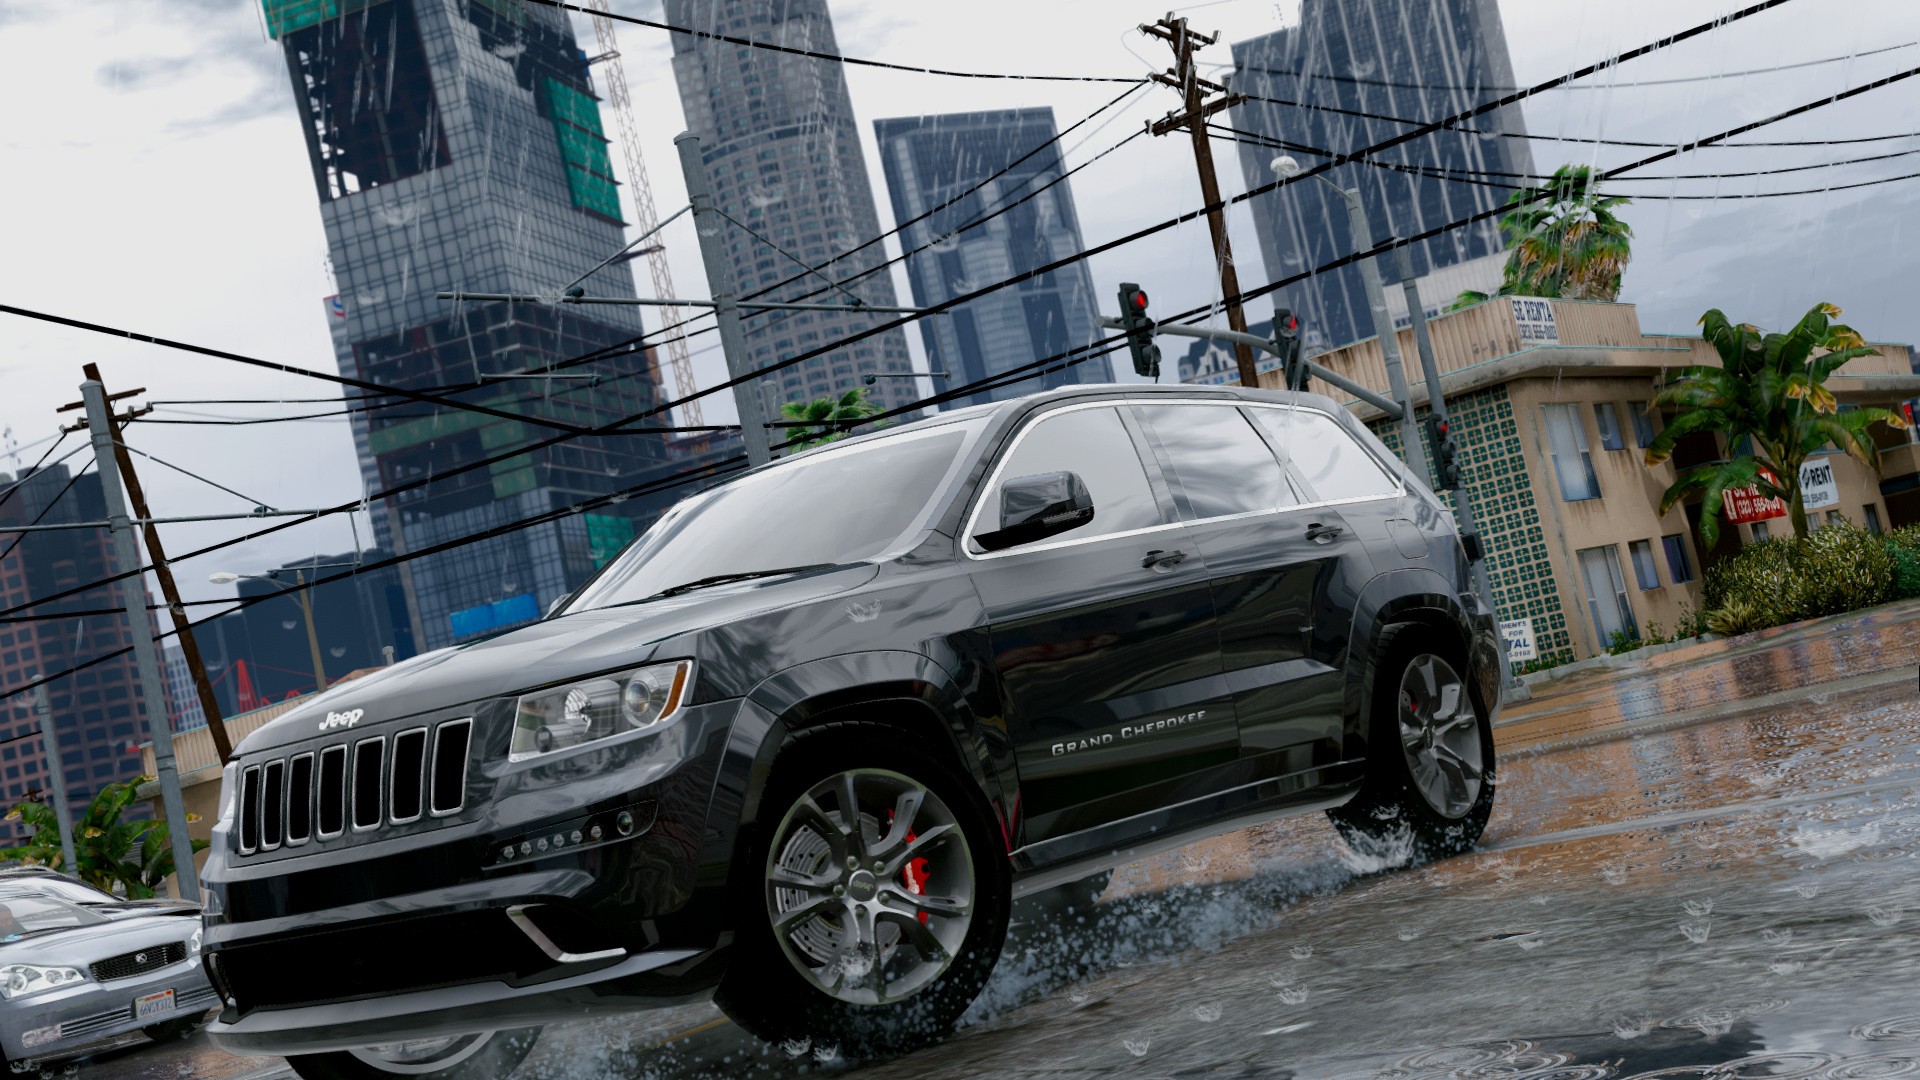 Grand Cherokee SRT8 2013 для GTA V - Скриншот 2